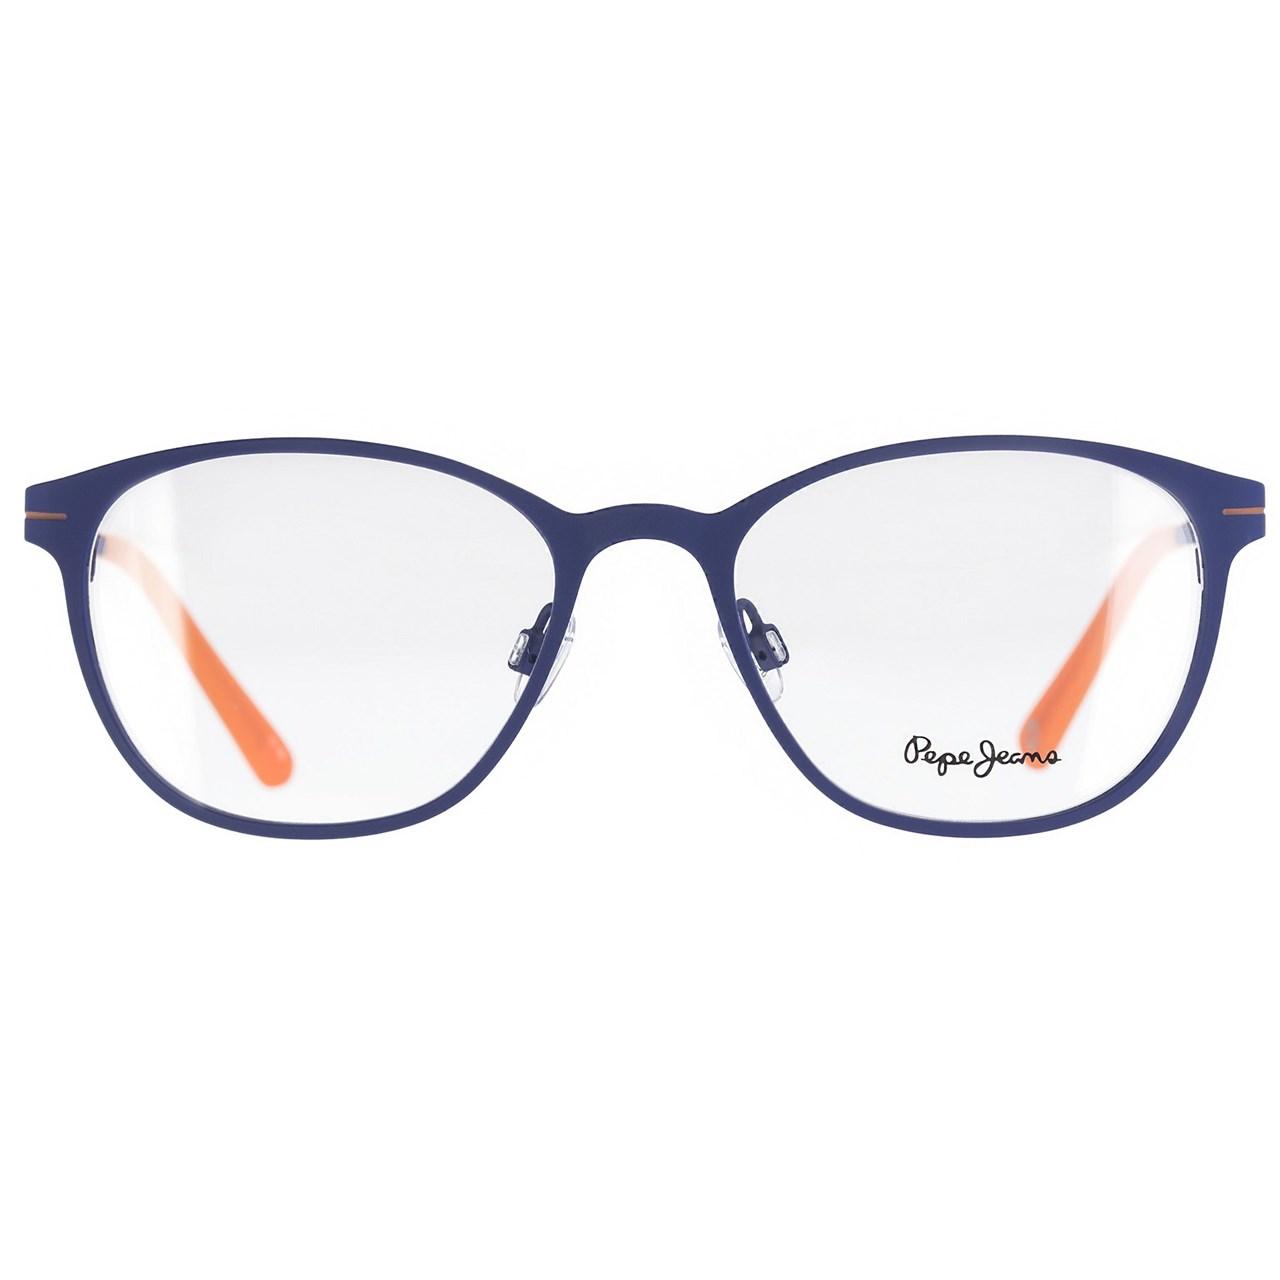 عینک طبی پپه جینز مدل PJ1231C452